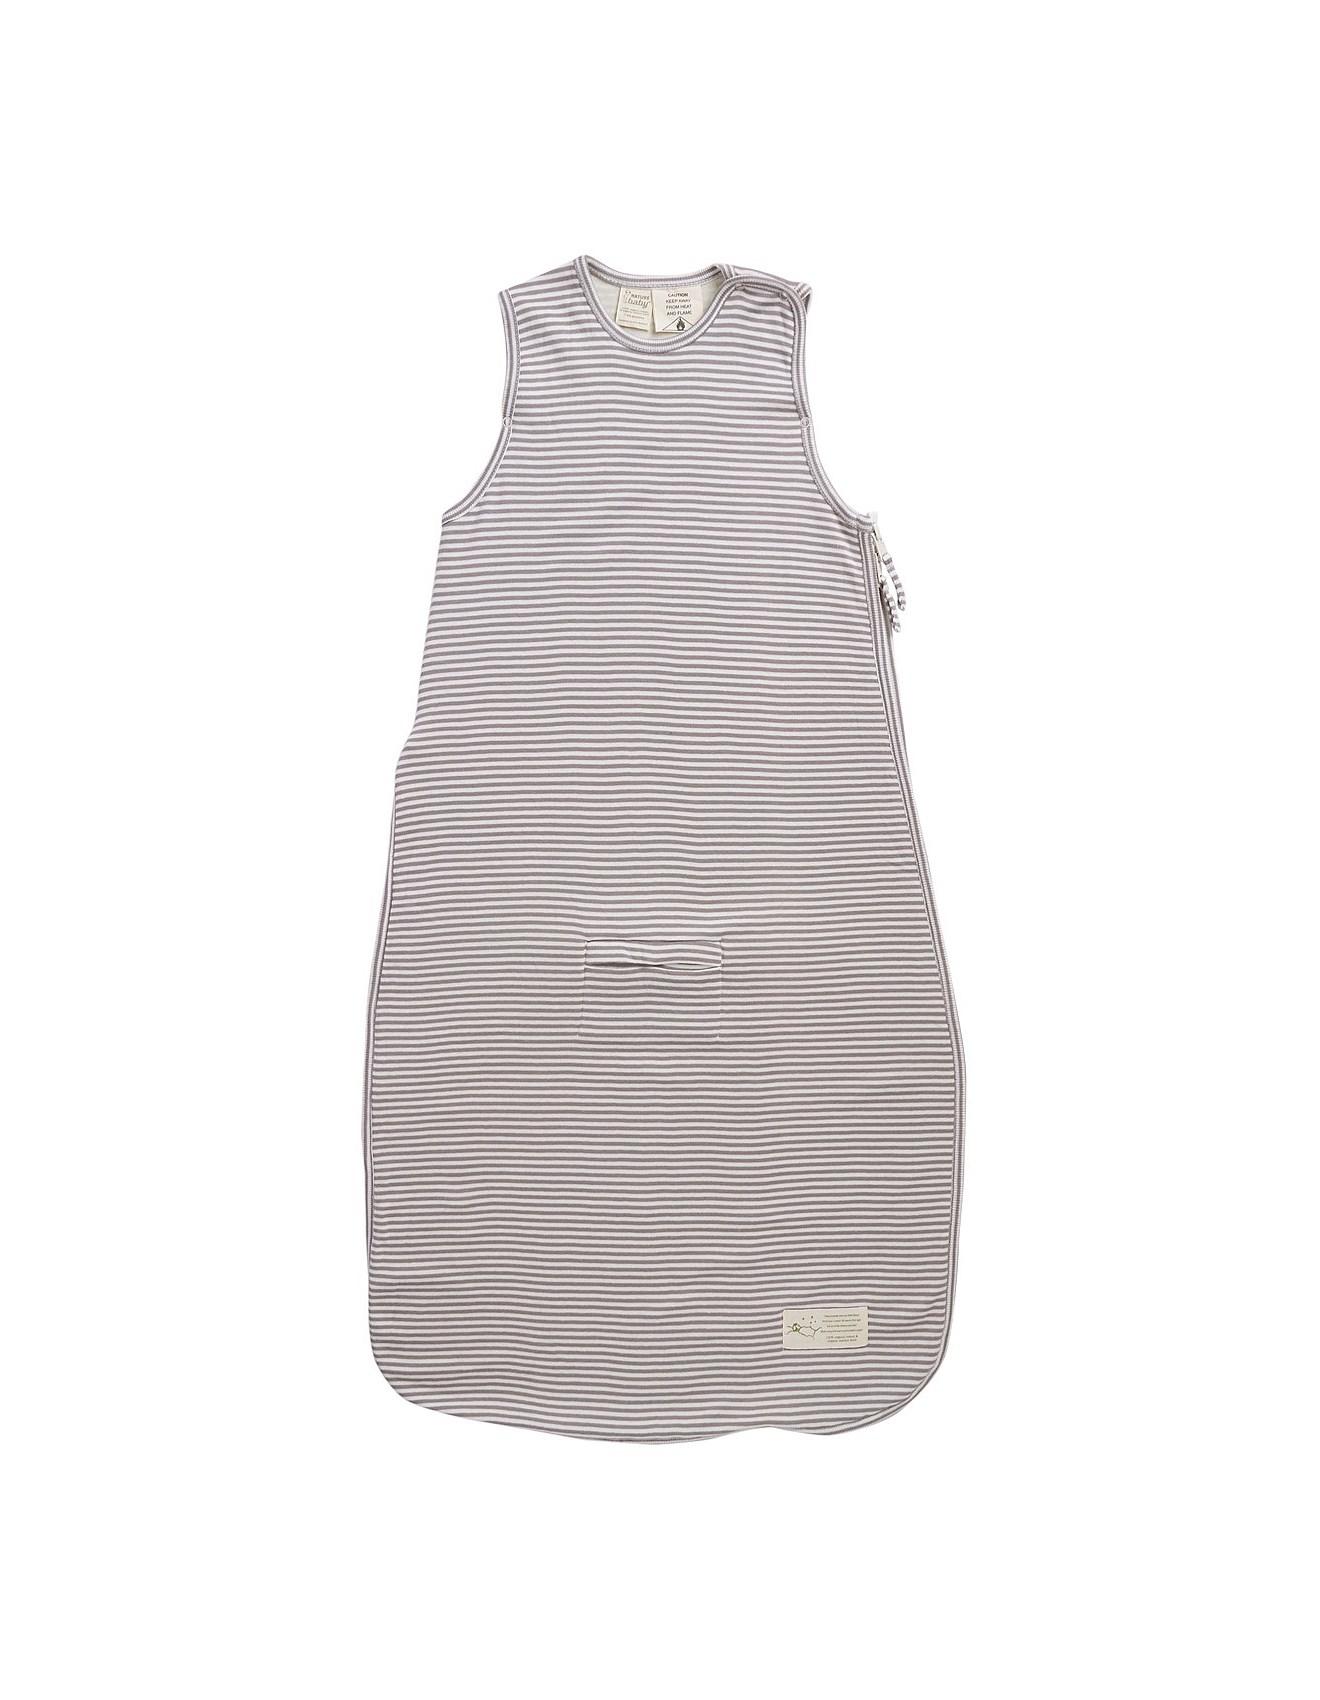 8f5b49793 Baby Clothing